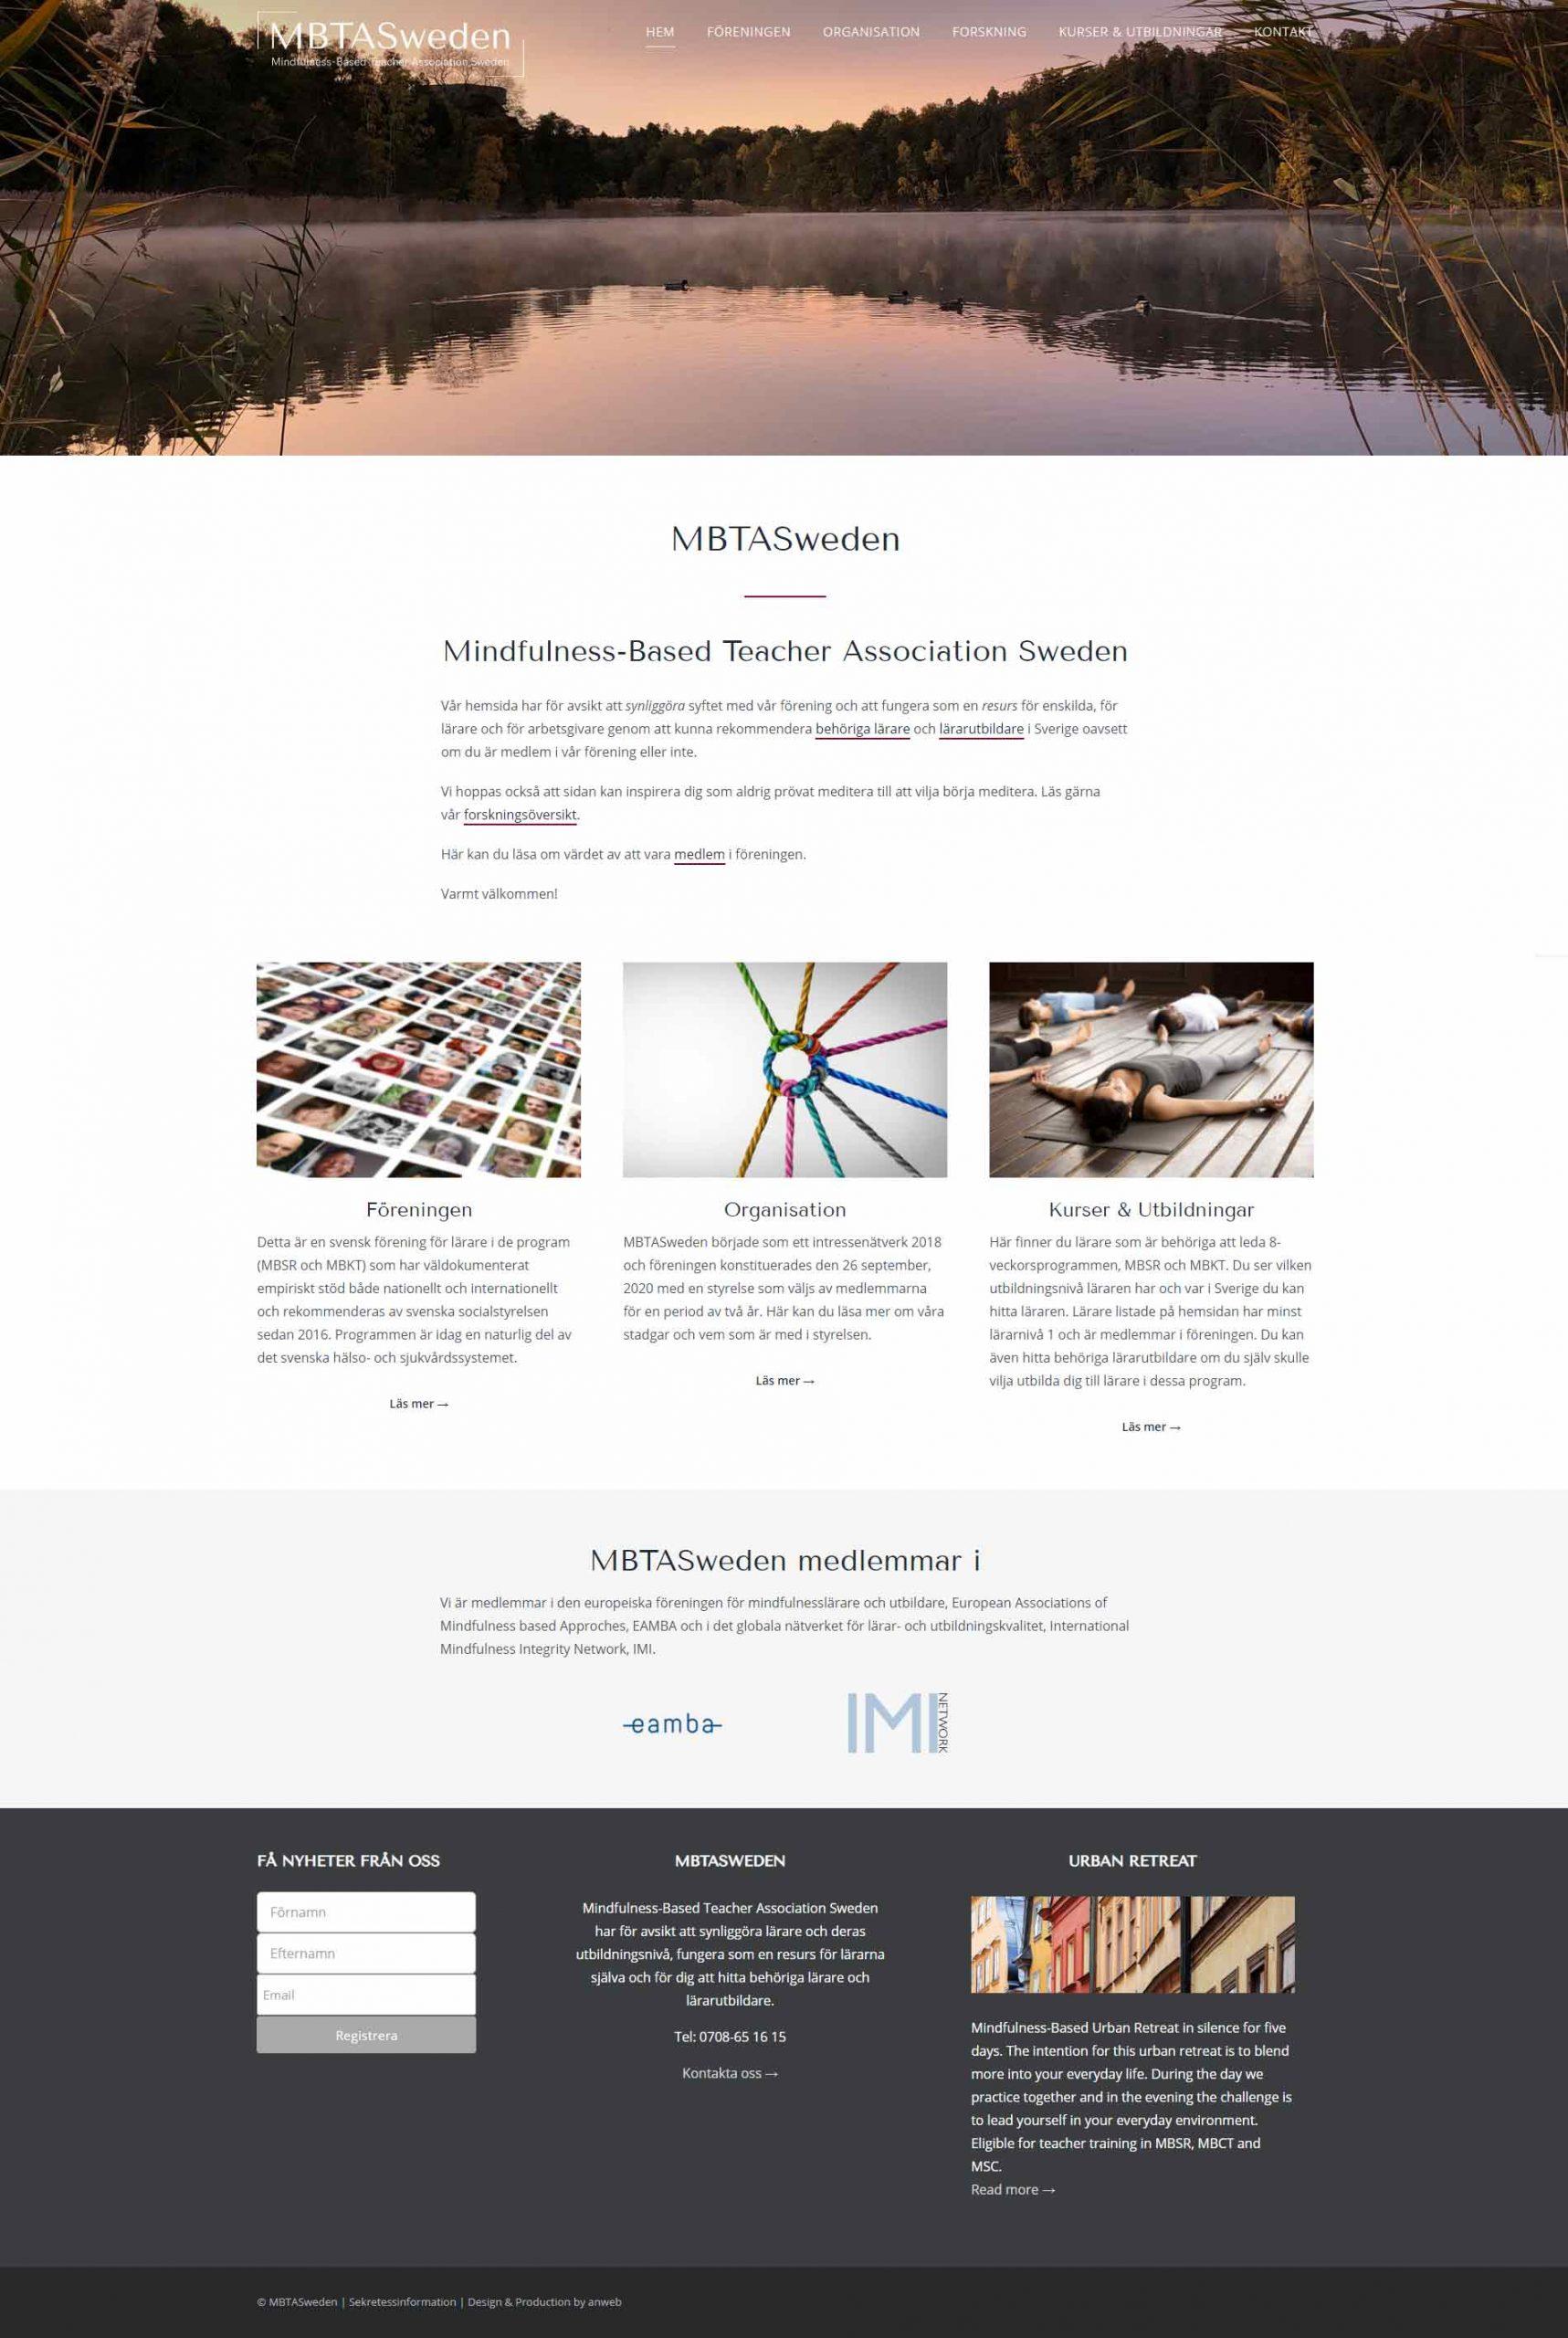 Web design anweb MBTASweden